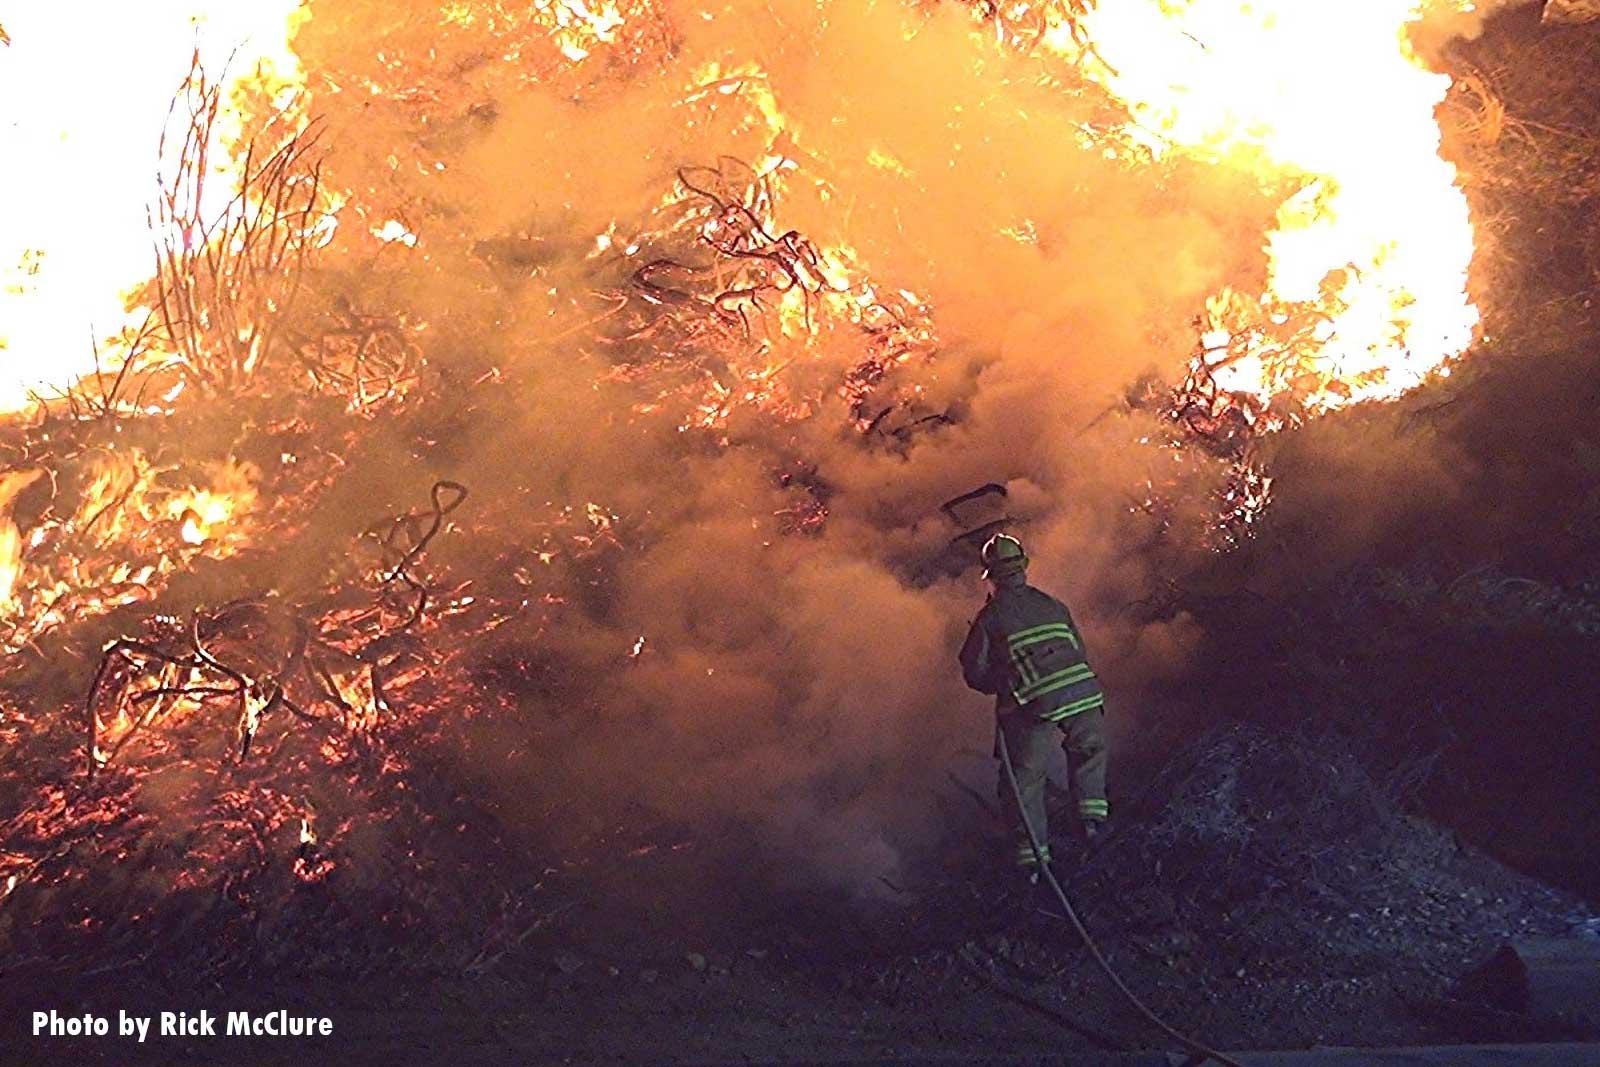 A firefighter advances a hose up a burning hill